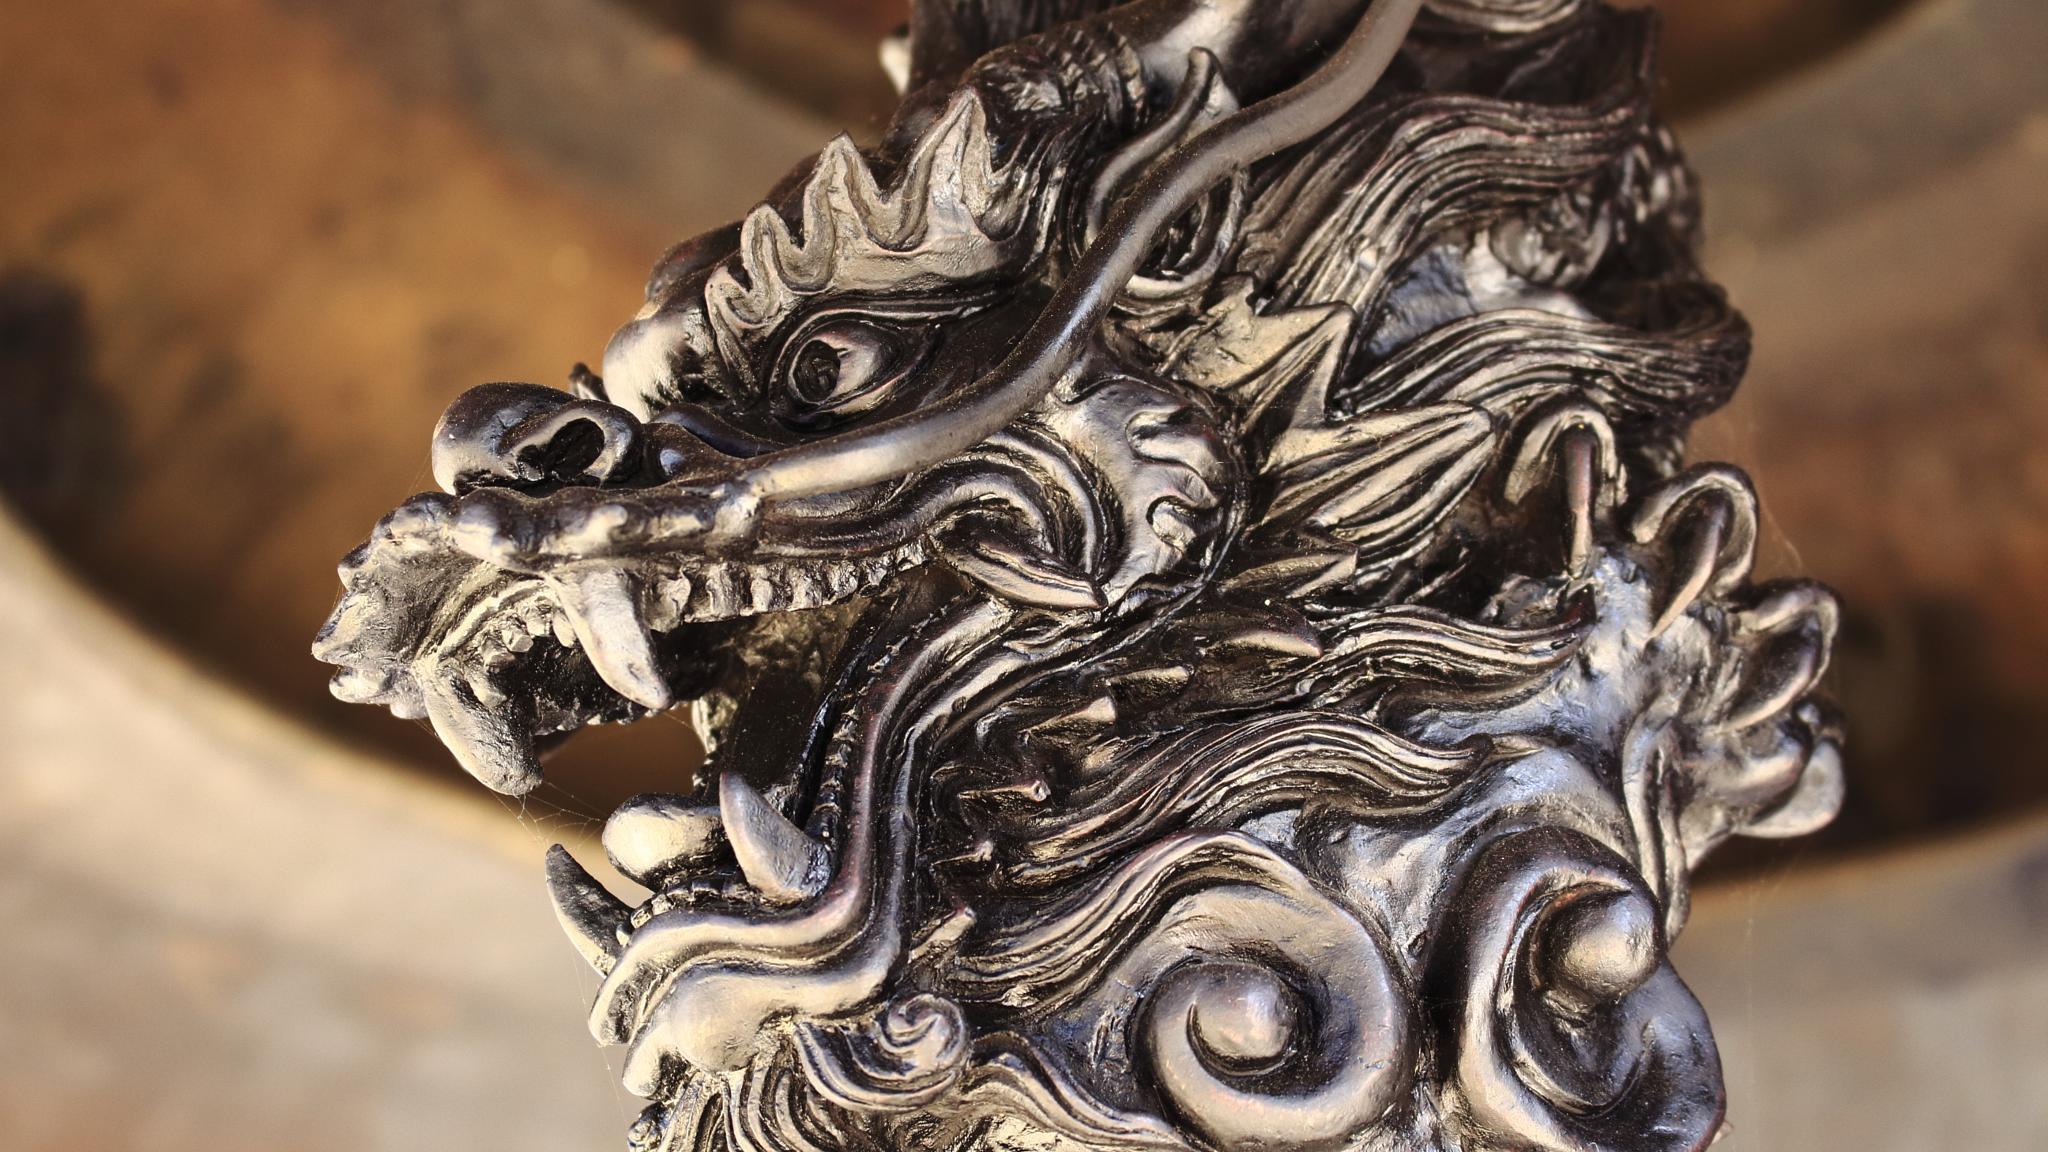 The pillar of incense burner by Chang-Tai Chen